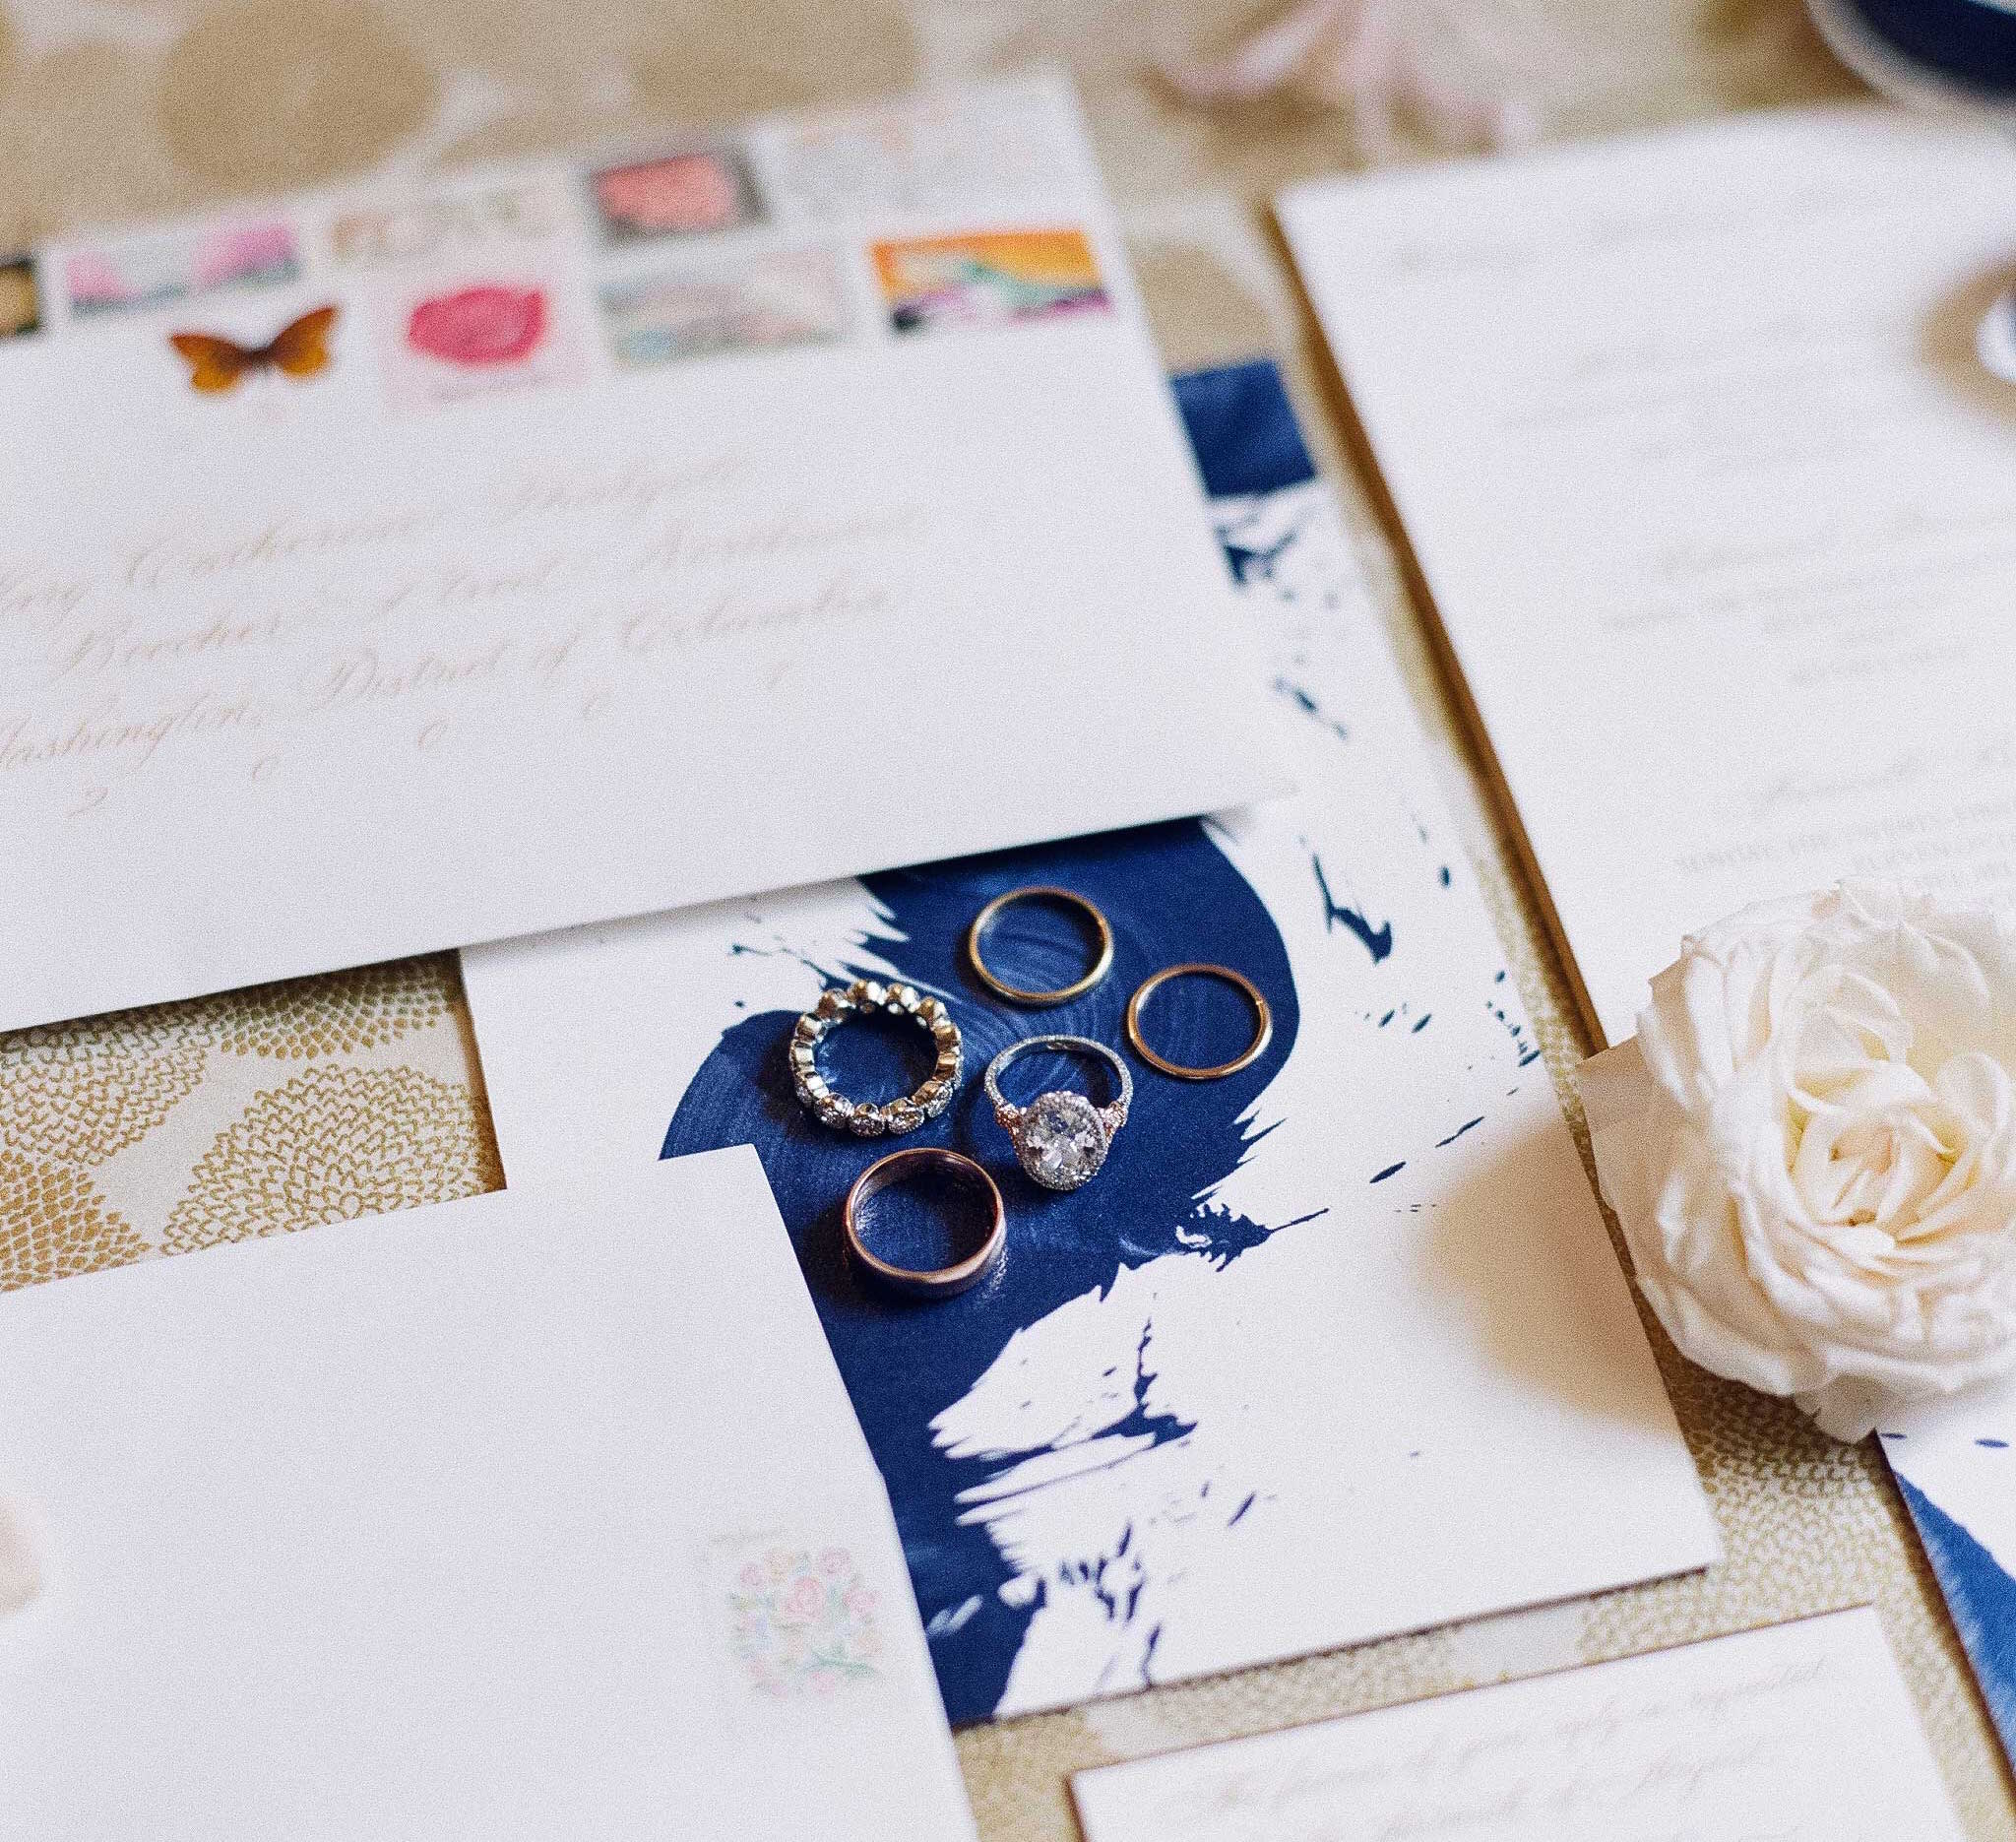 Custom wedding invitation with blue paint brush stroke design